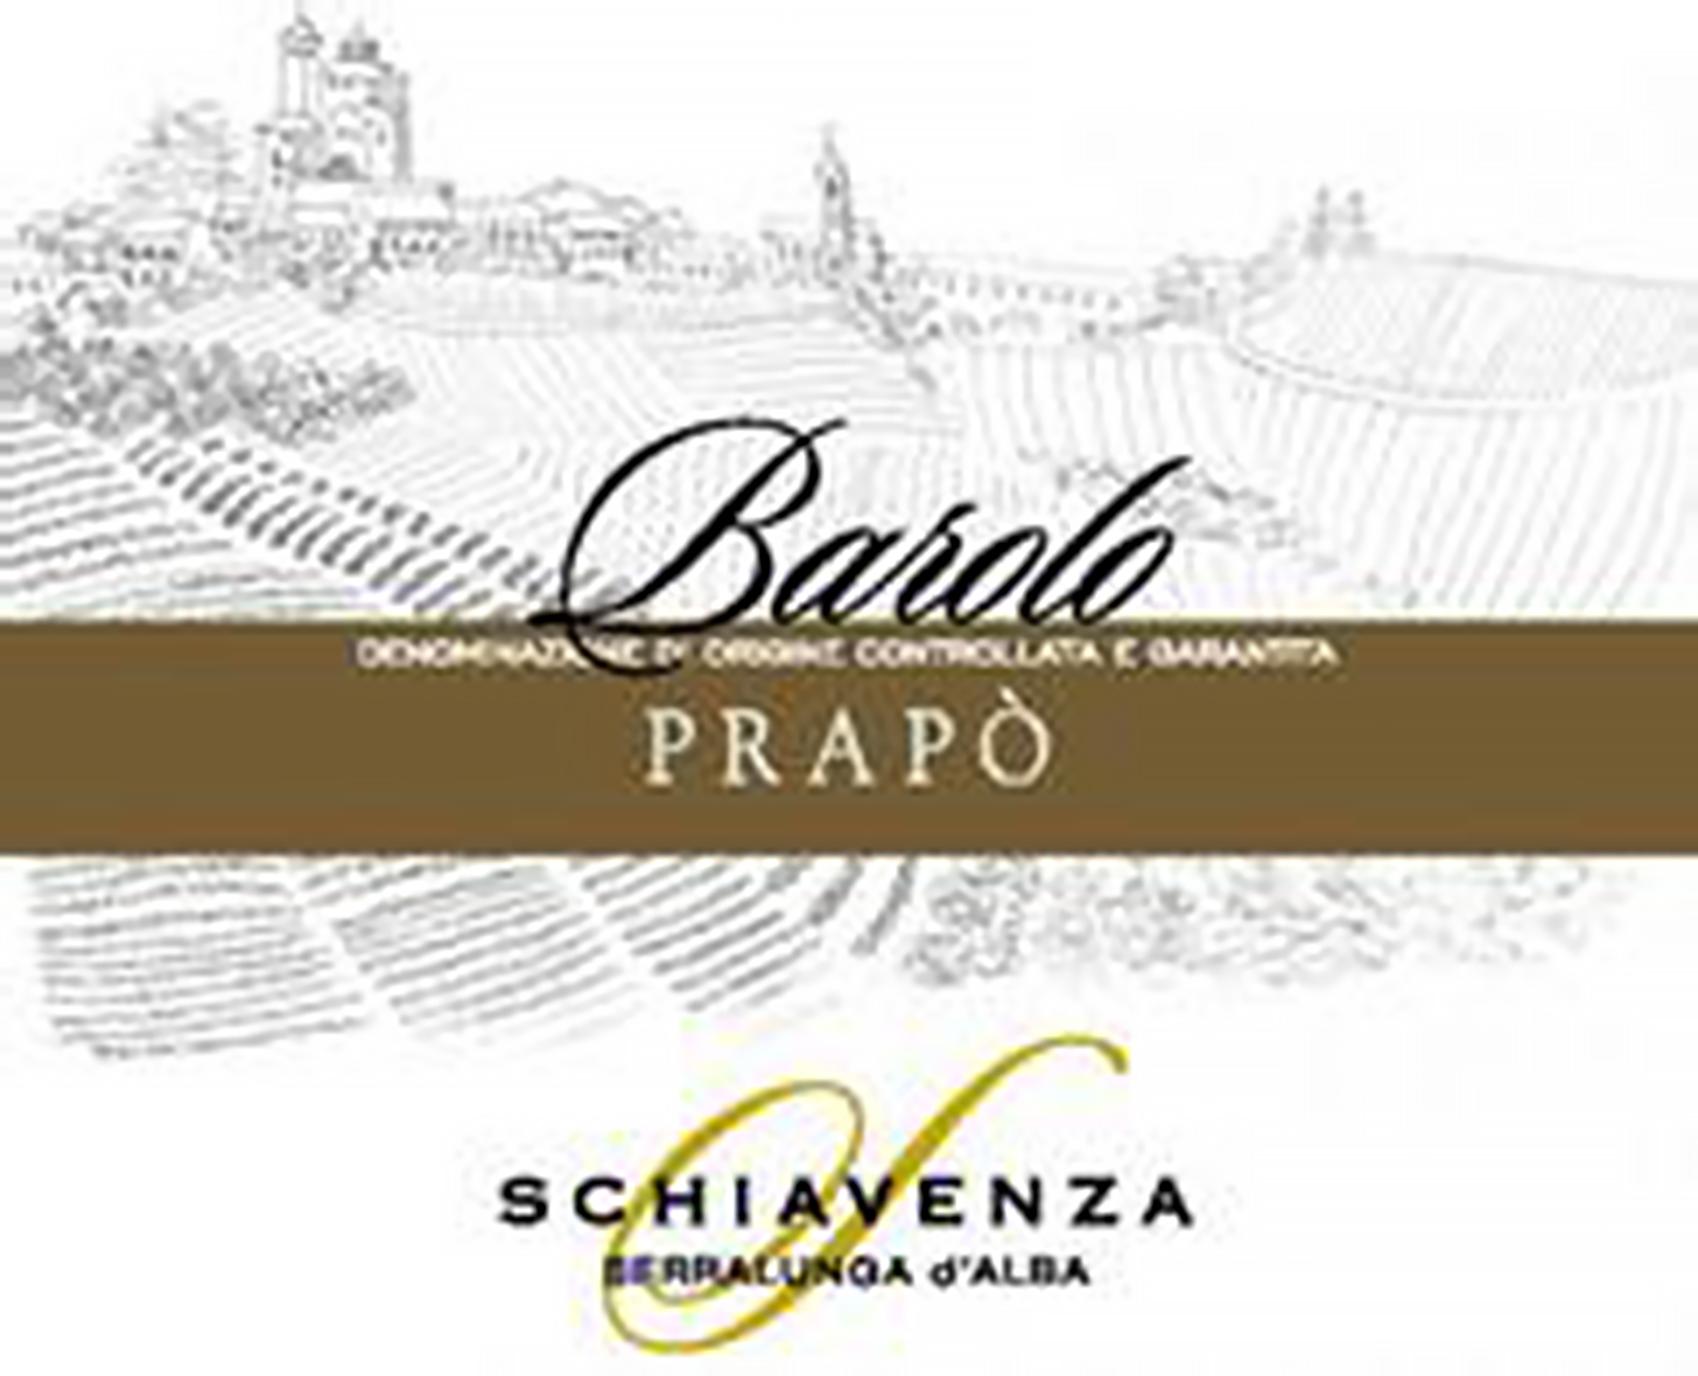 Schiavenza Barolo Prapo 2016